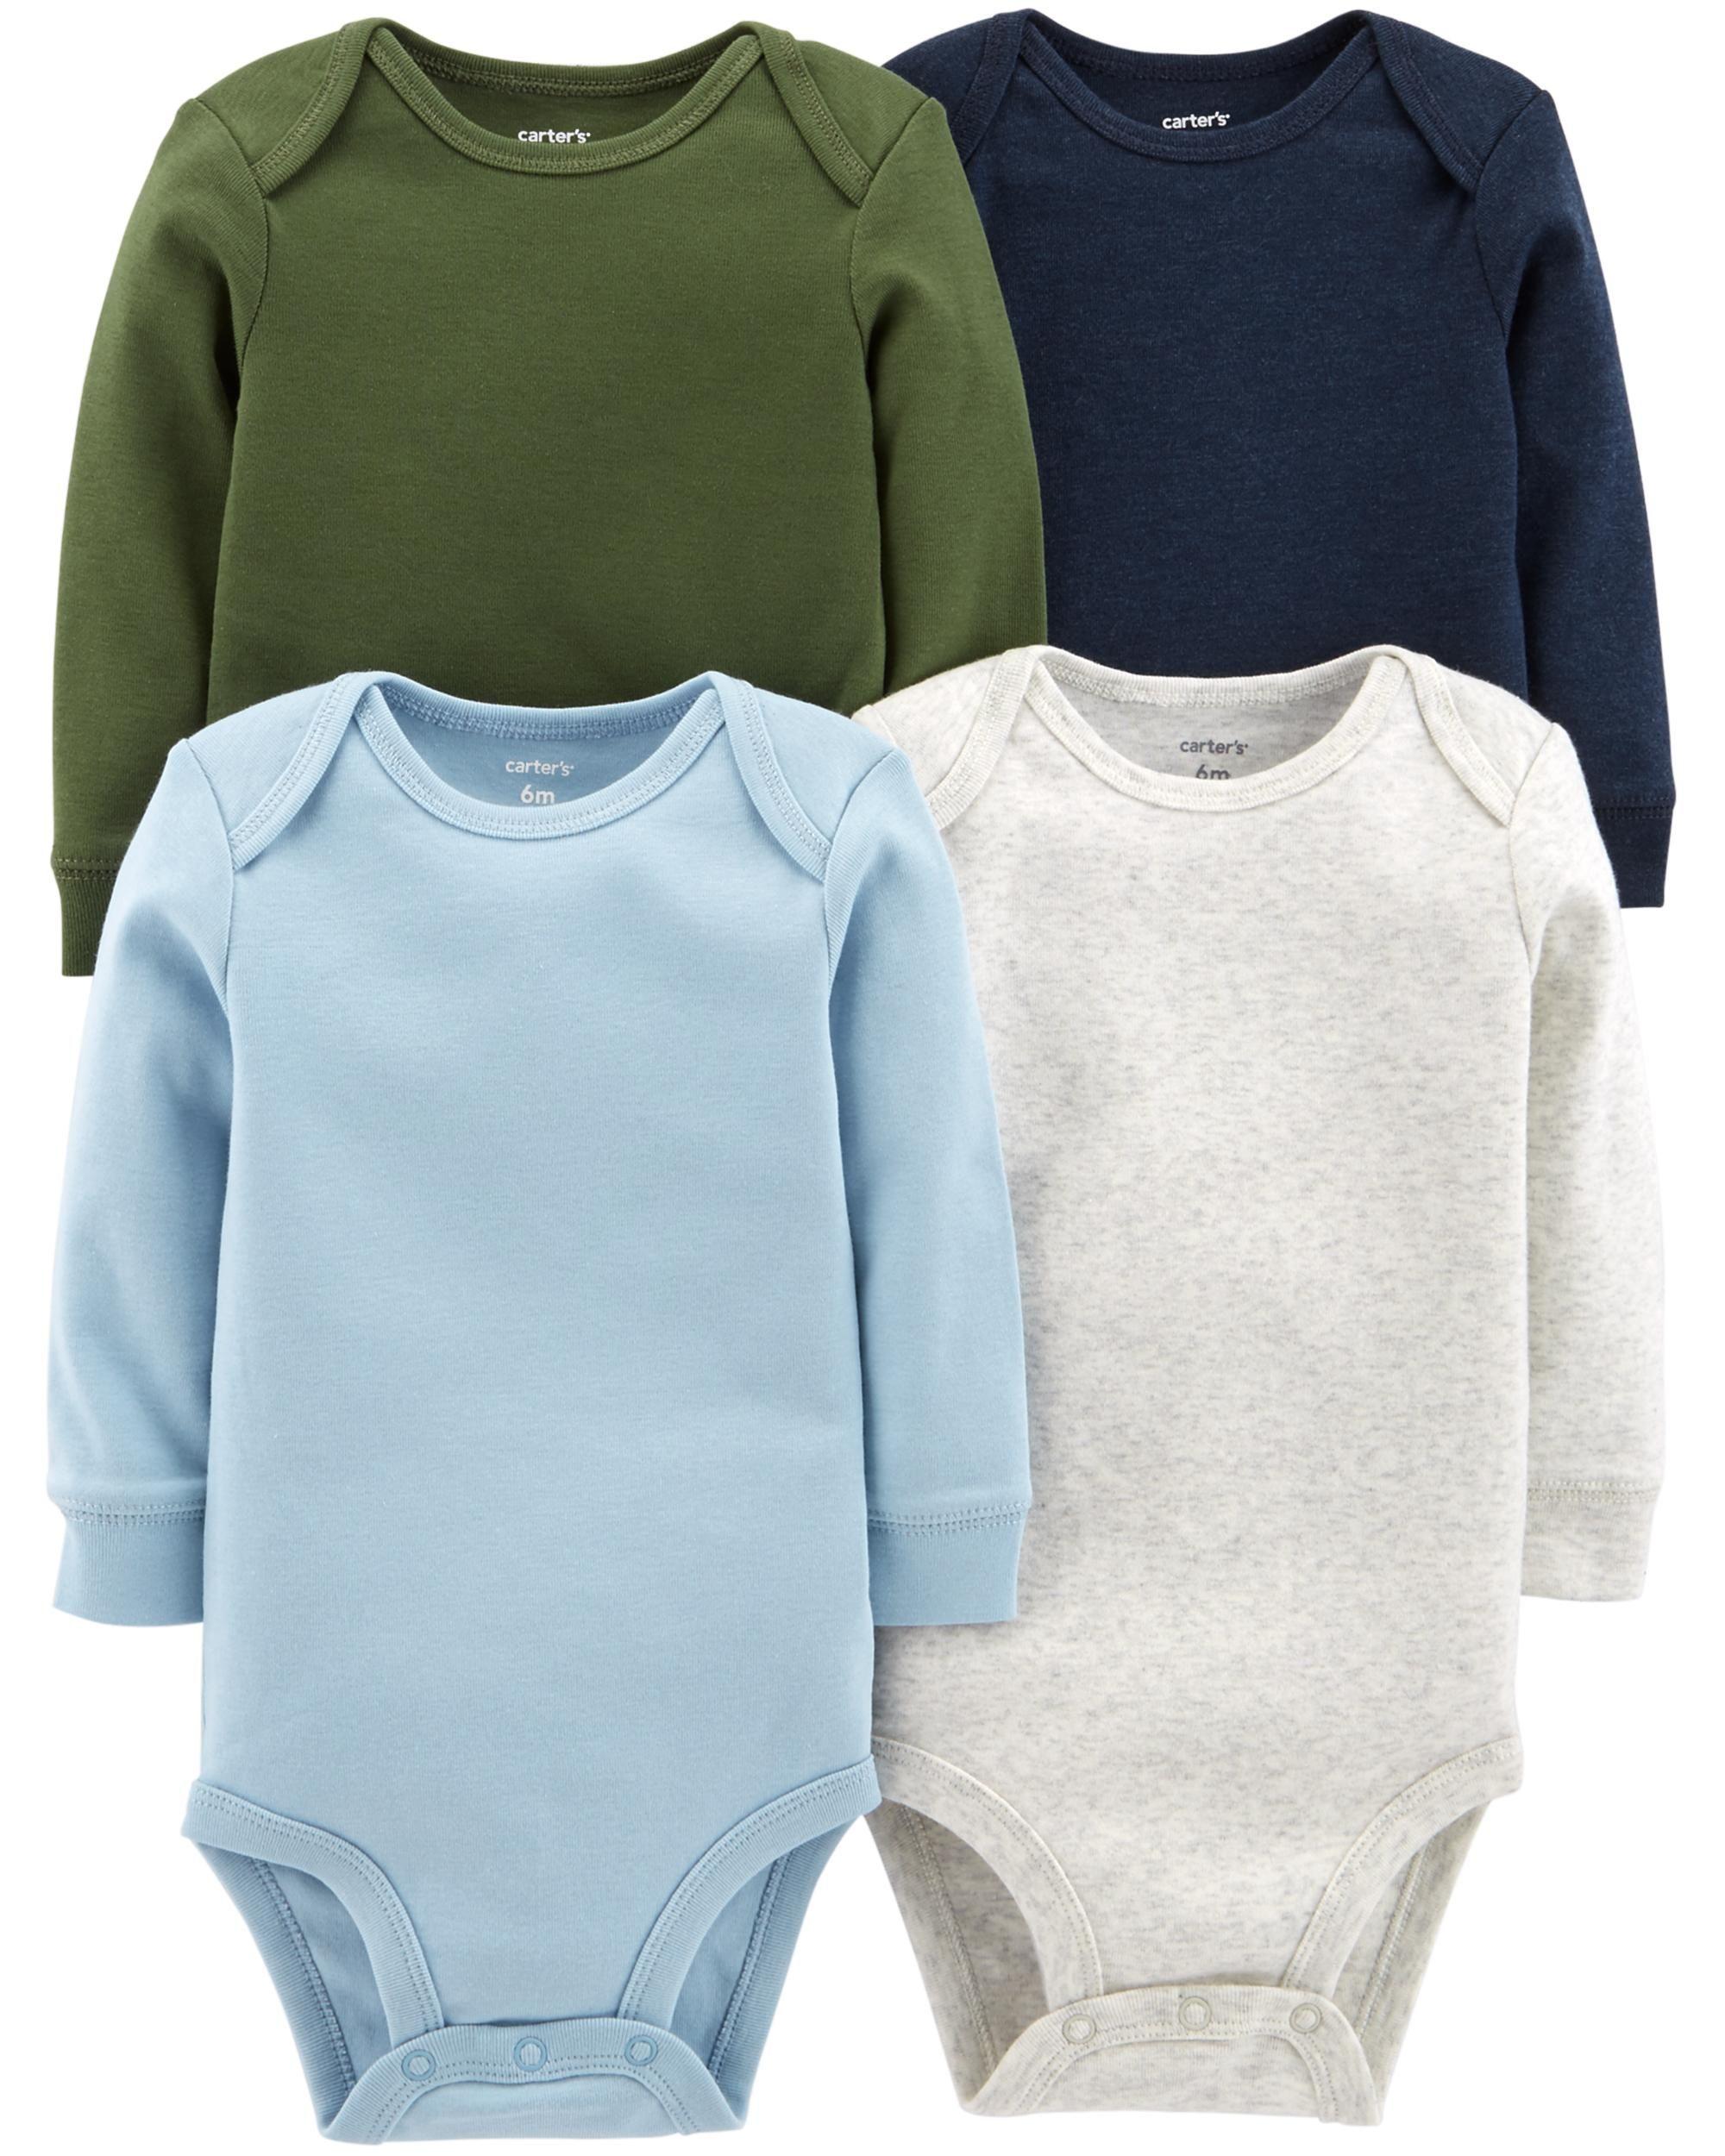 b9e91068a 4-Pack Long-Sleeve Original Bodysuits | carters | Carters baby boys ...